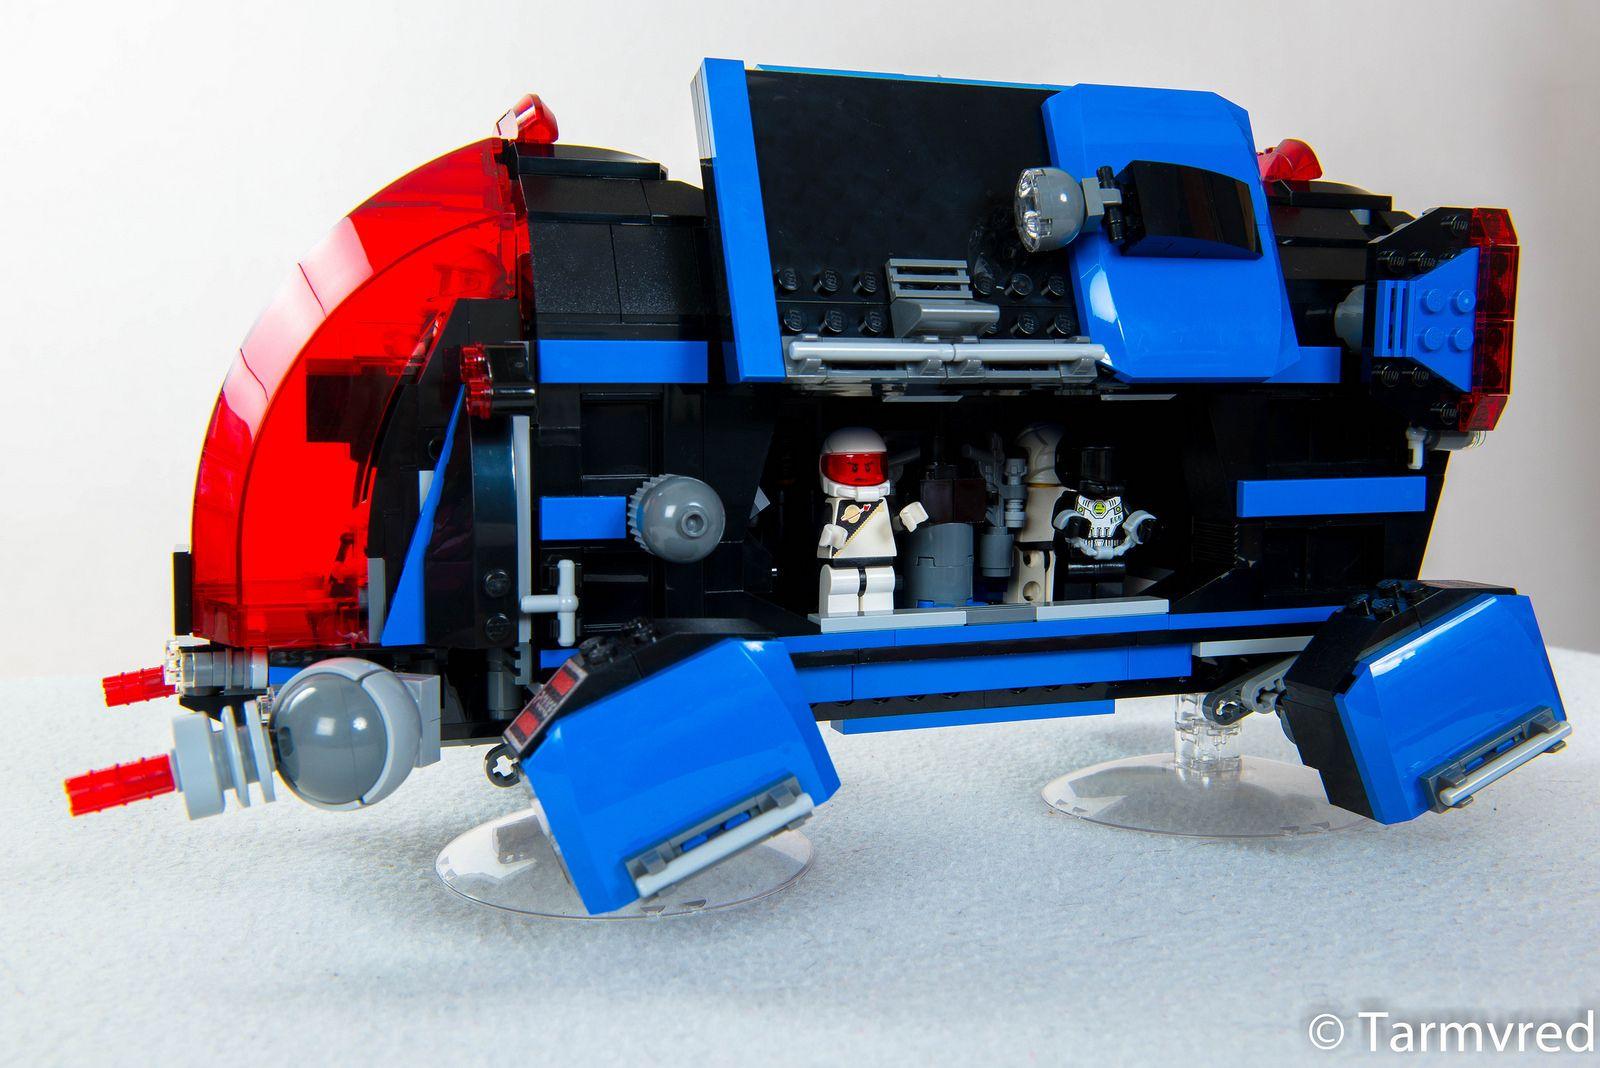 Super Secret Spacepolice Dropship Lego Space Lego Creative Lego Spaceship